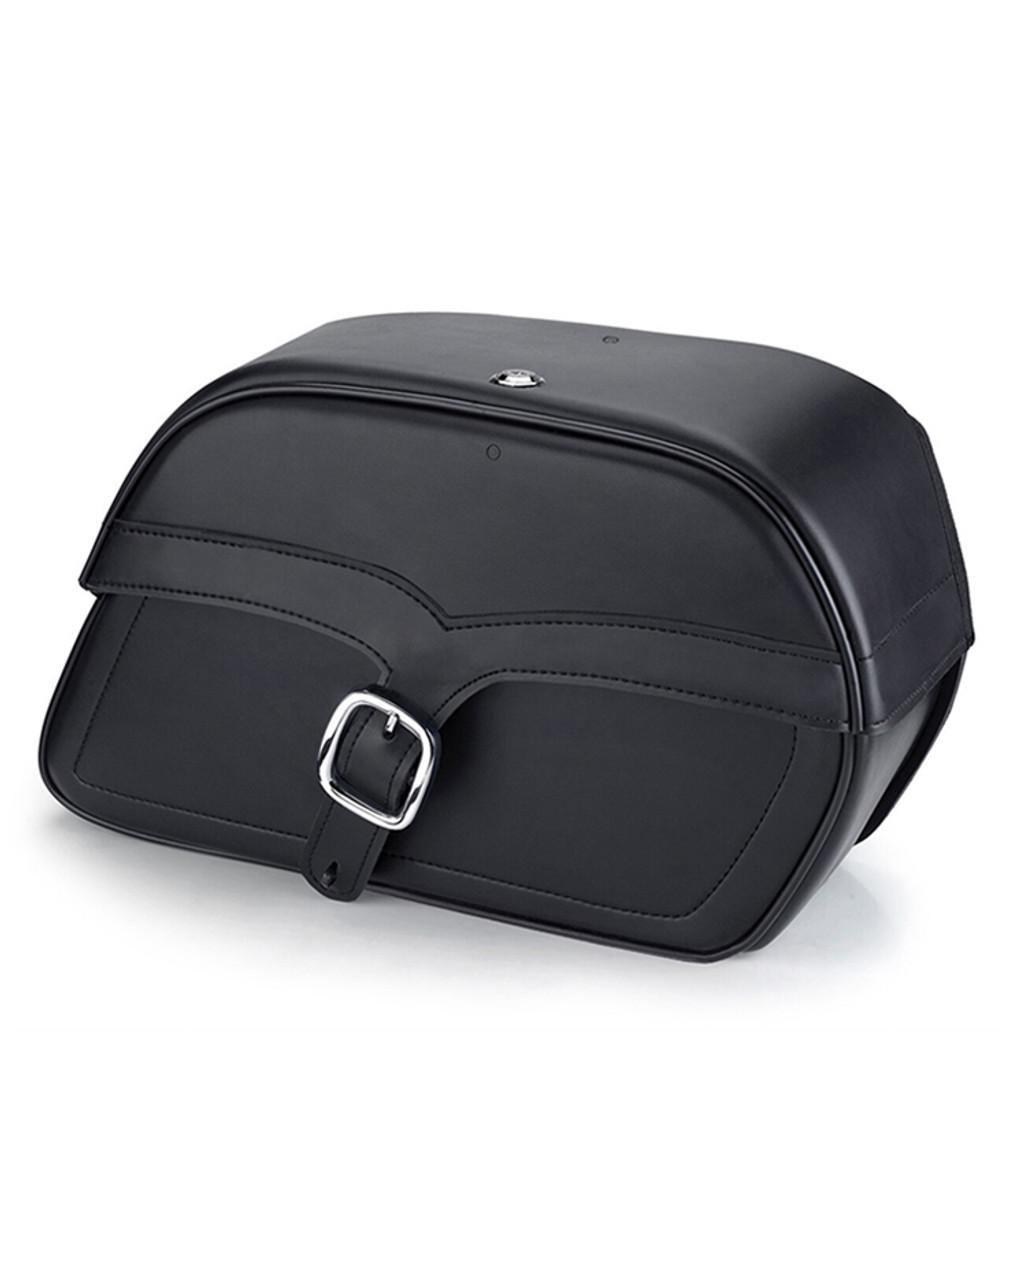 Honda 1500 Valkyrie Interstate Vikingbags Shock Cutout Single Strap Large Slanted Leather Motorcycle Saddlebags Main Bag View